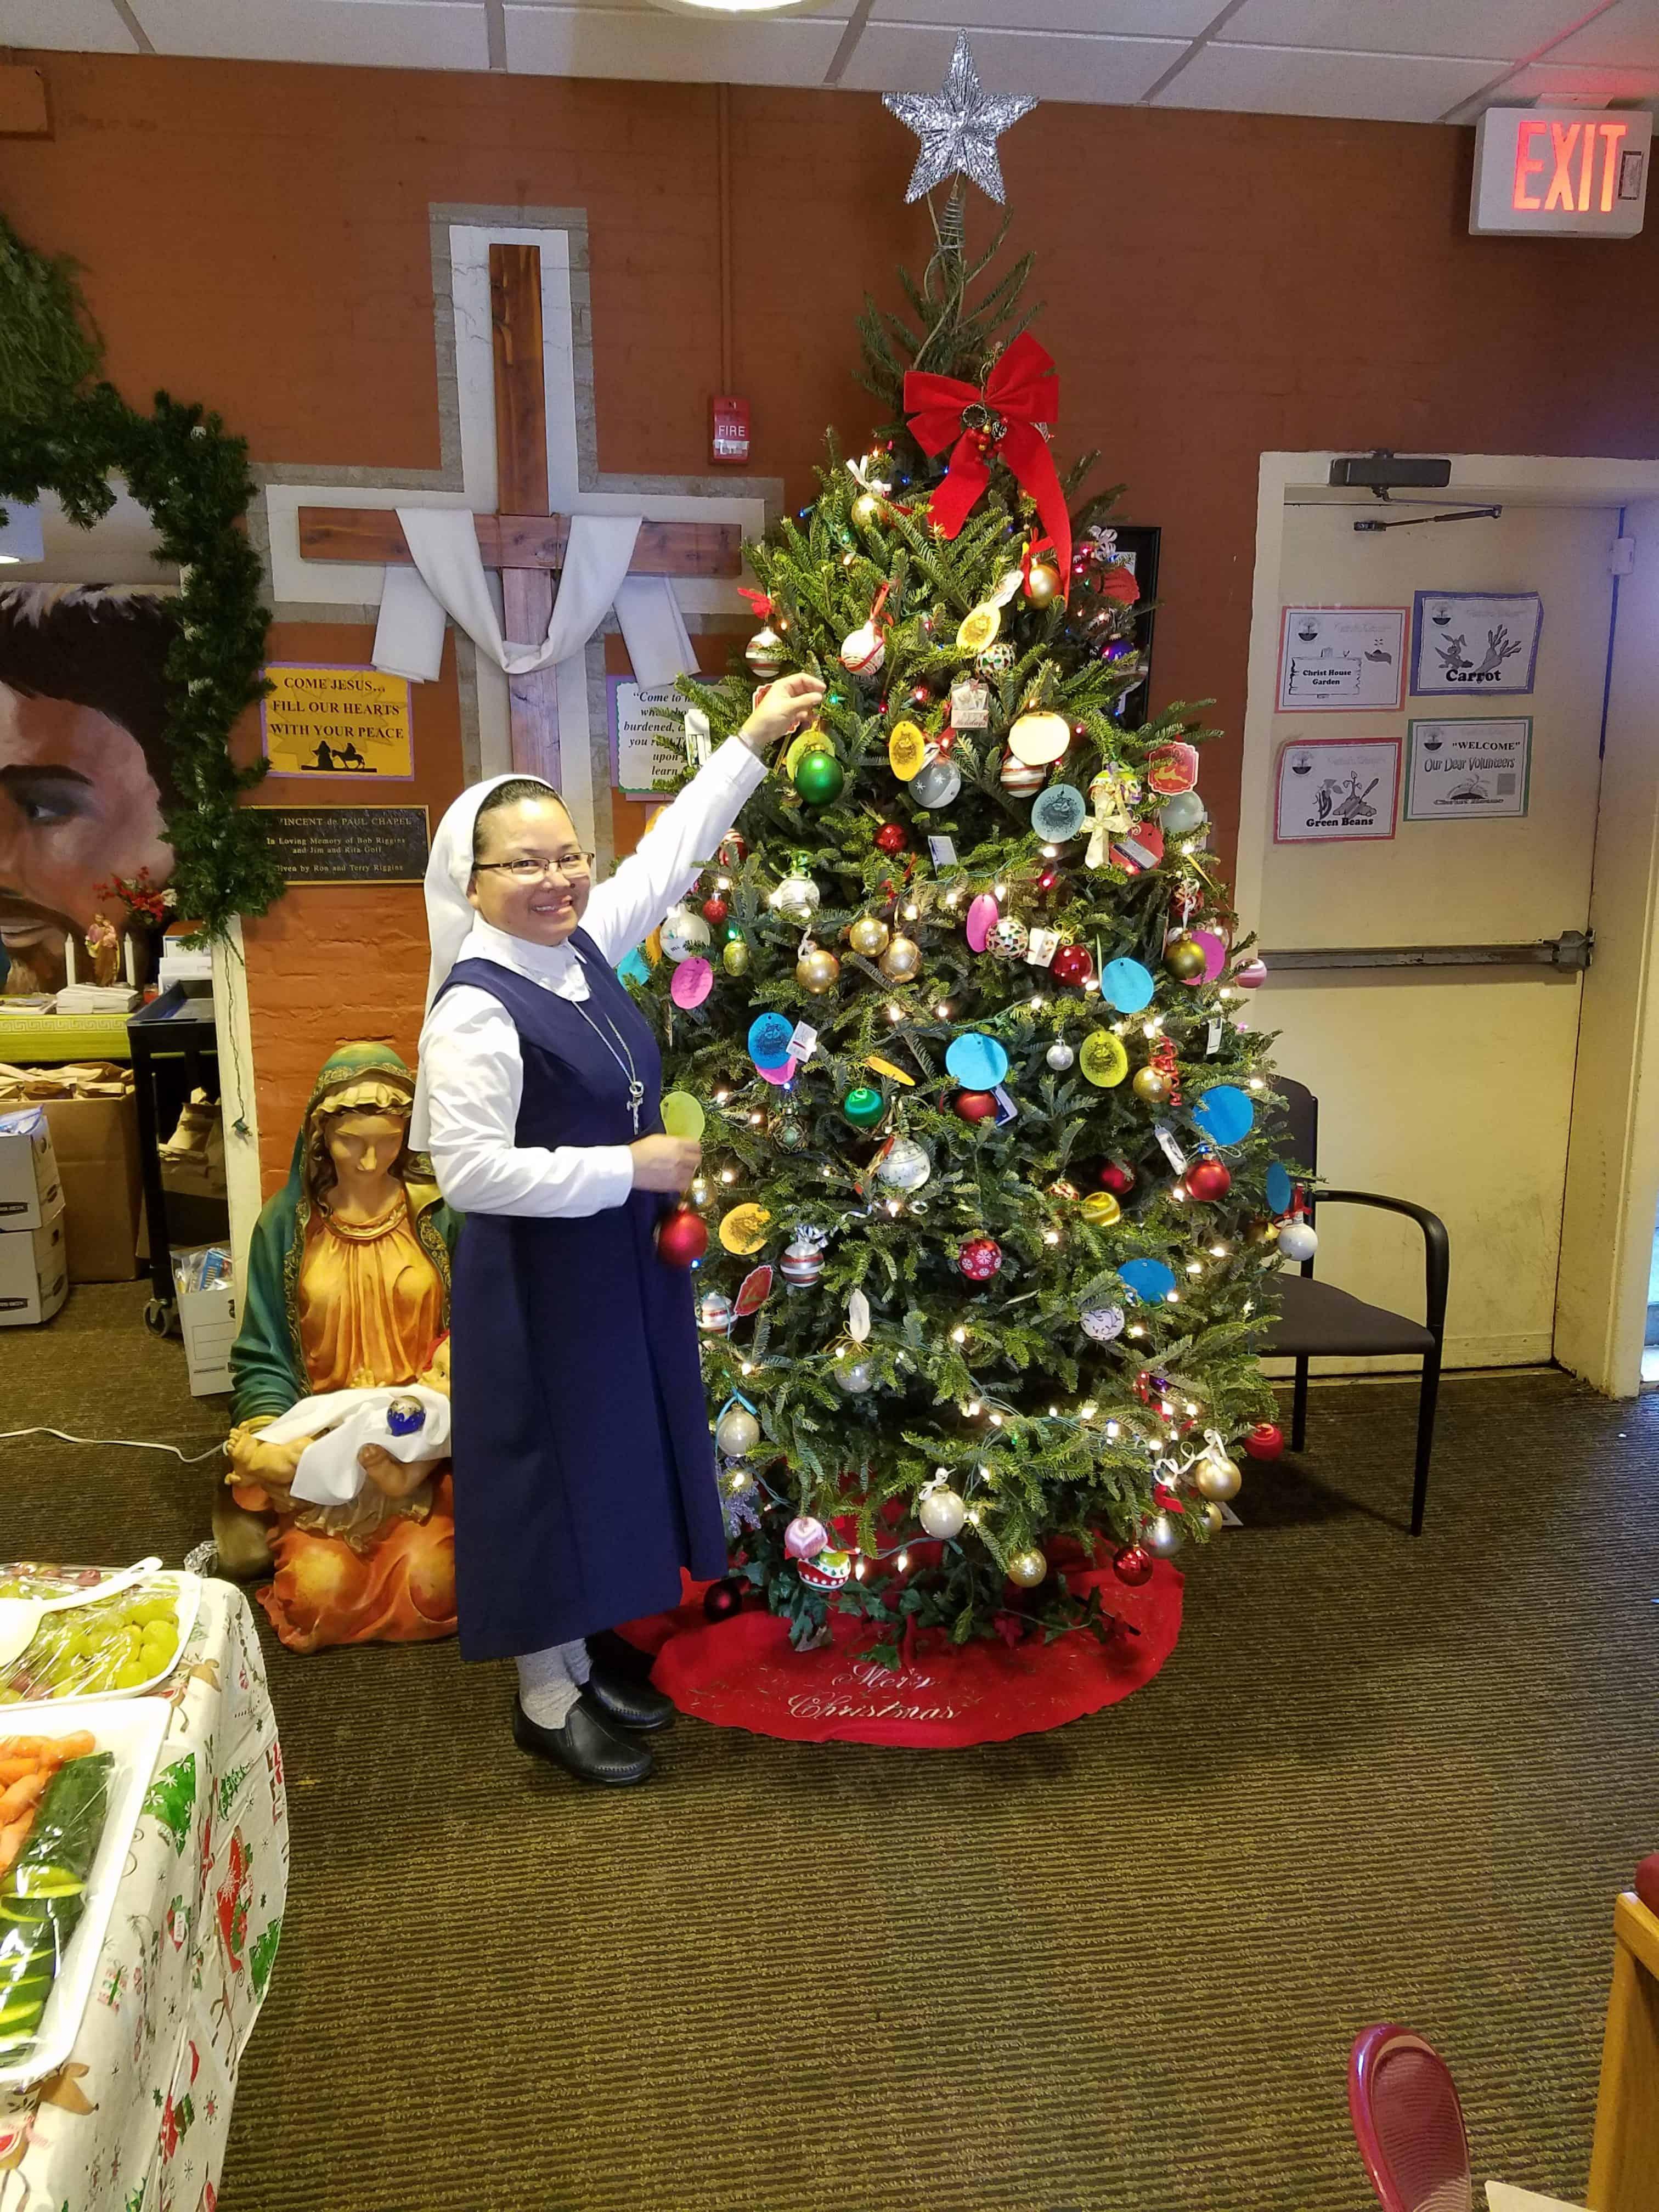 Tis The Season Of Giving Community Jesus House Torry